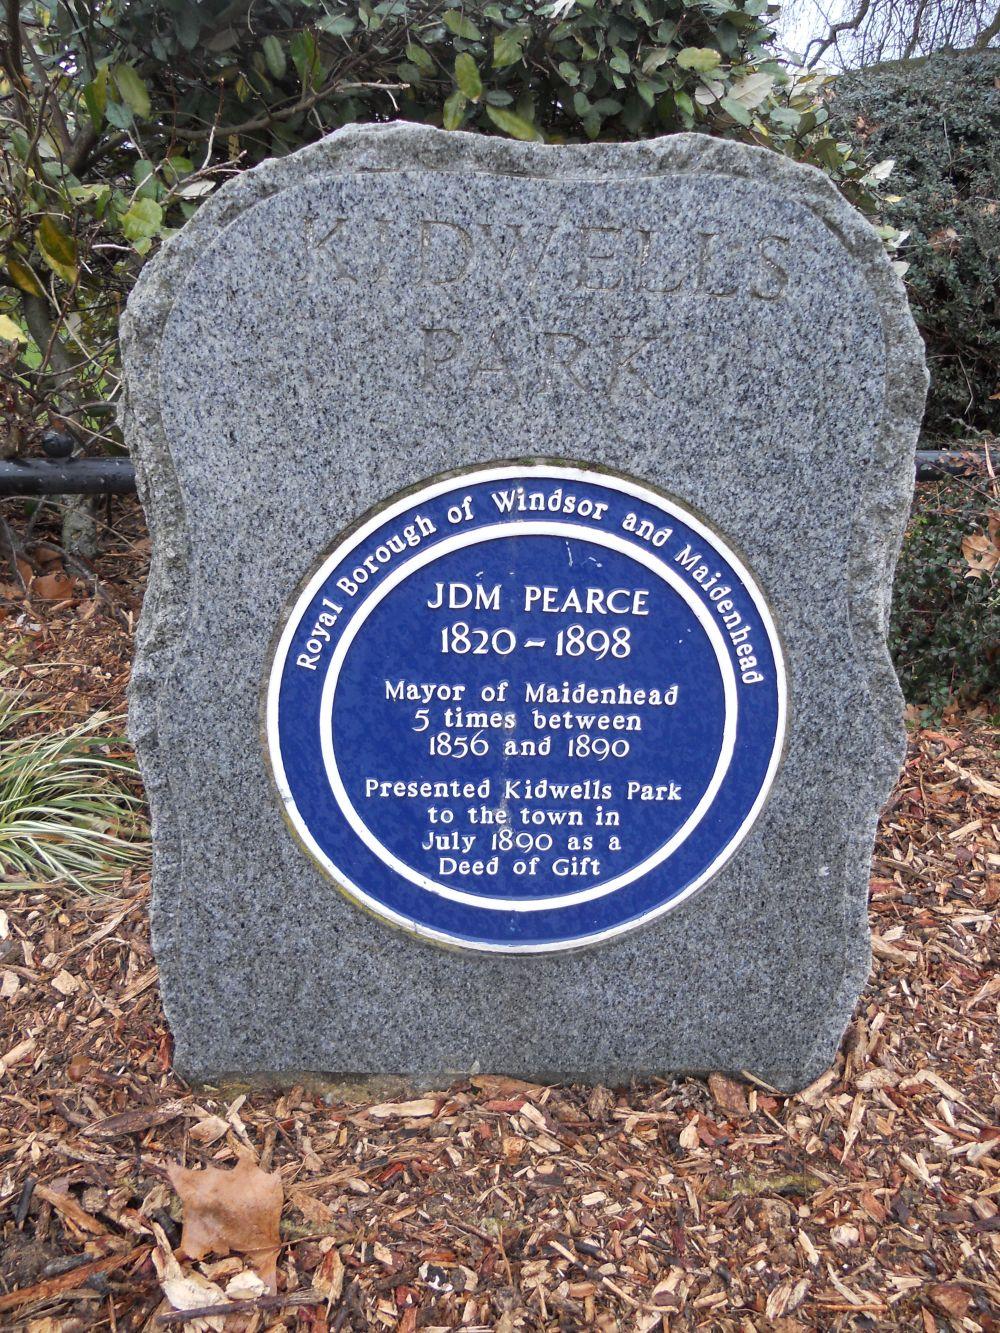 Kidwells Park commemorative plaque to JDM Pearce